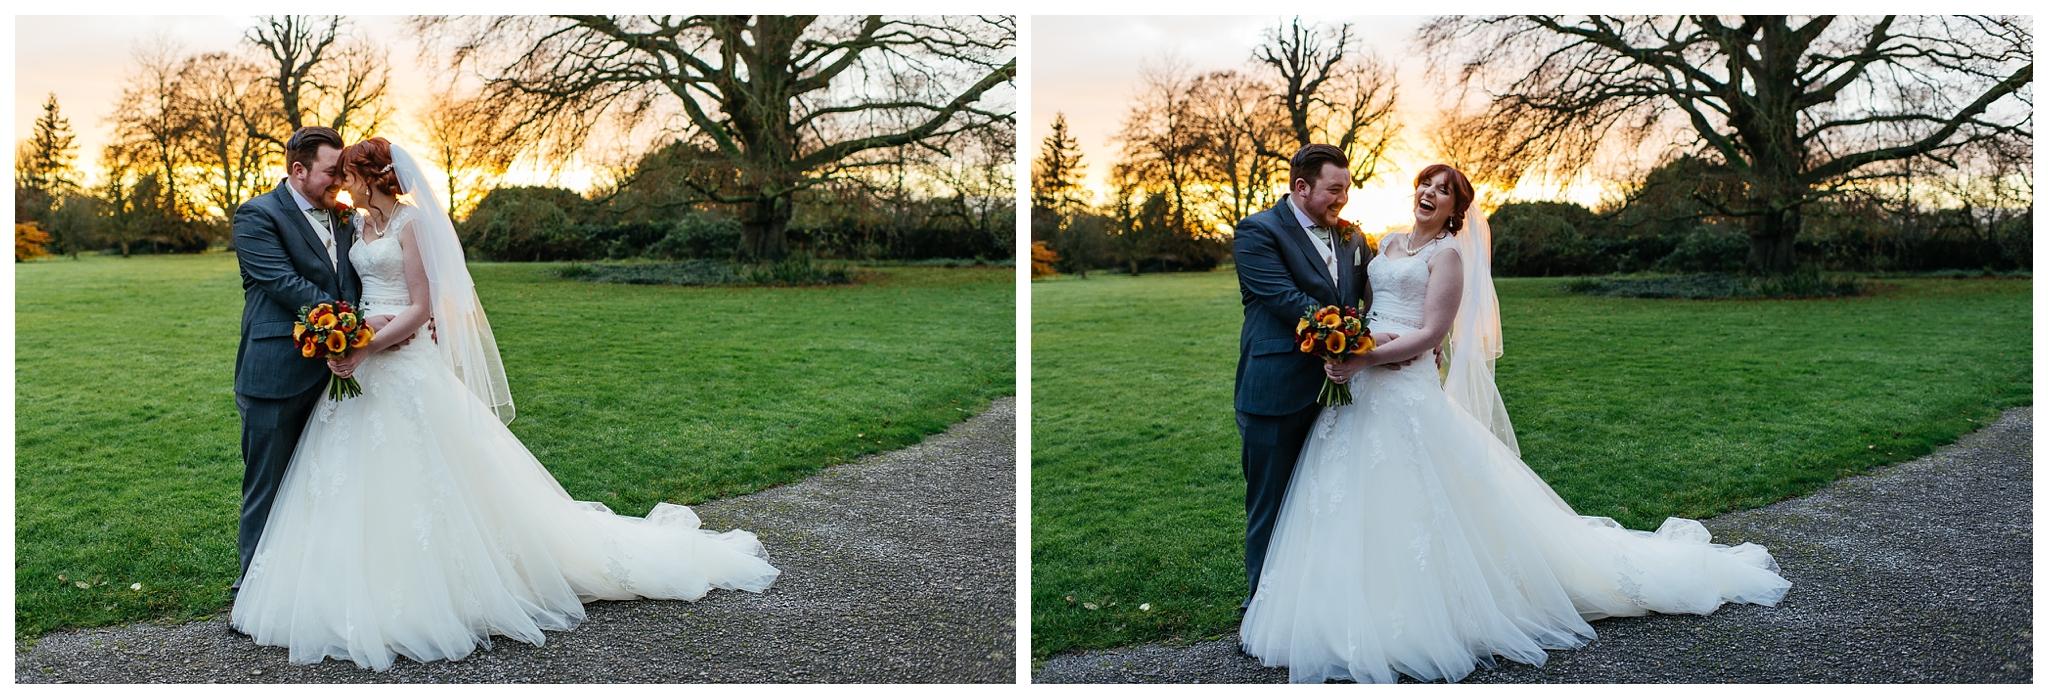 Emma&Paul-Elmore-Court-Winter-Wedding-Nikki-Cooper-Photography_0059.jpg